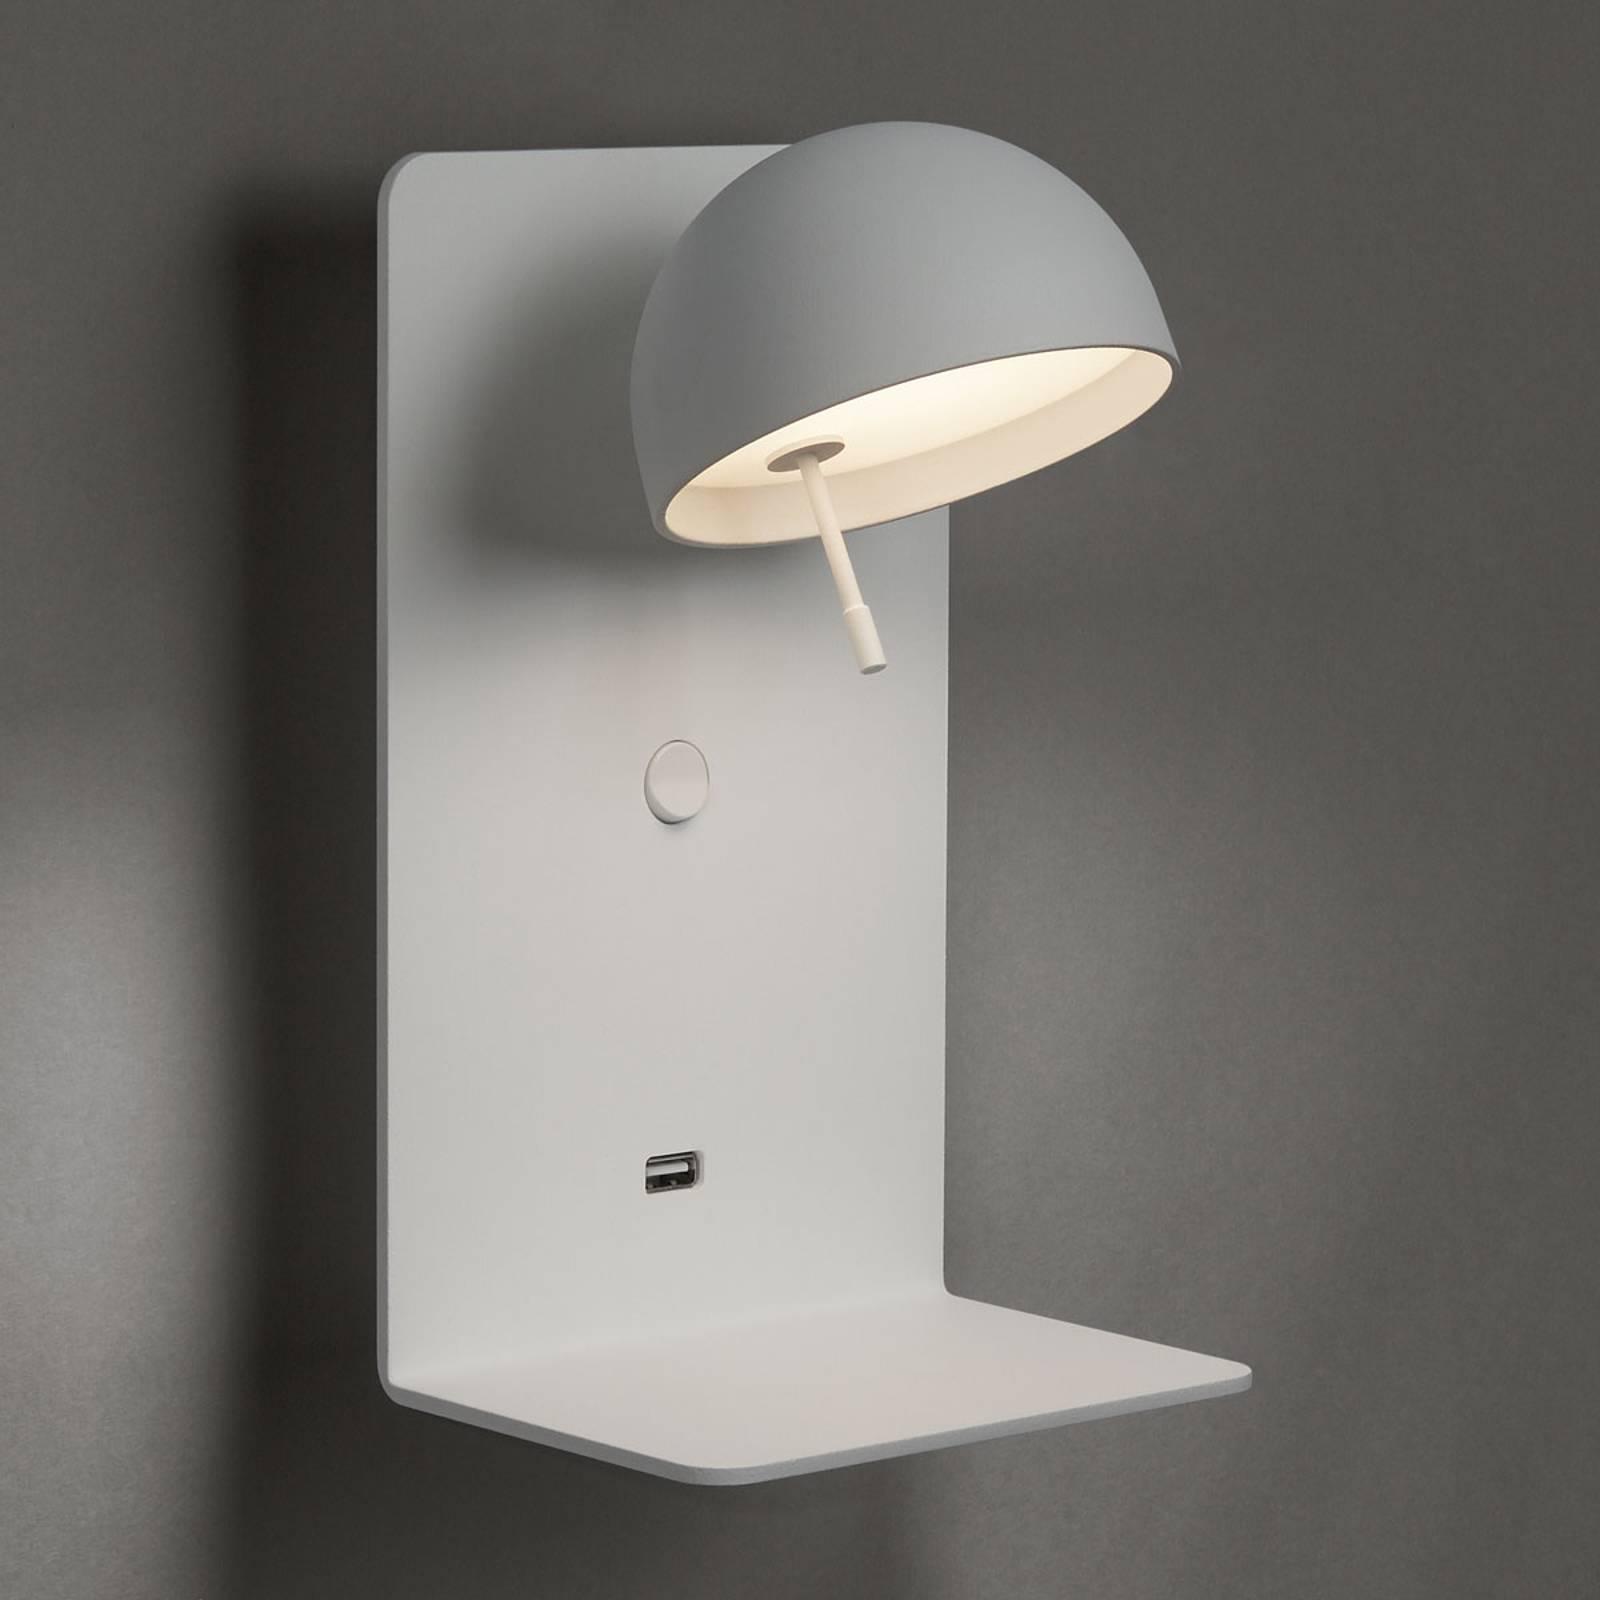 Bover Beddy A/02 LED wandlamp wit met USB-poort